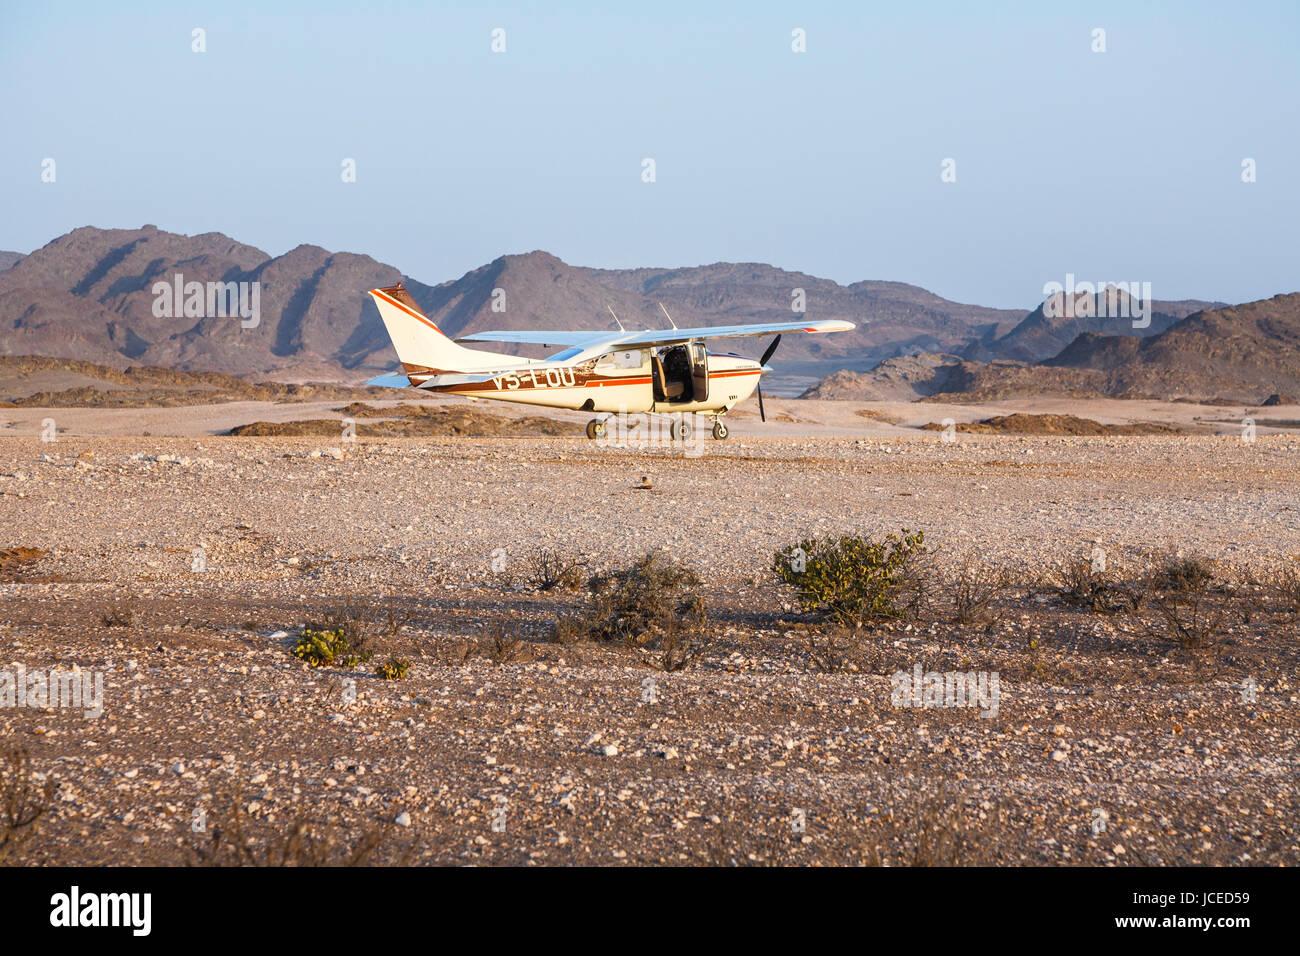 Cessna 210 Centurion II on the ground, landed in the arid Namib Desert Namibia, Skeleton Coast, south-west Africa; - Stock Image